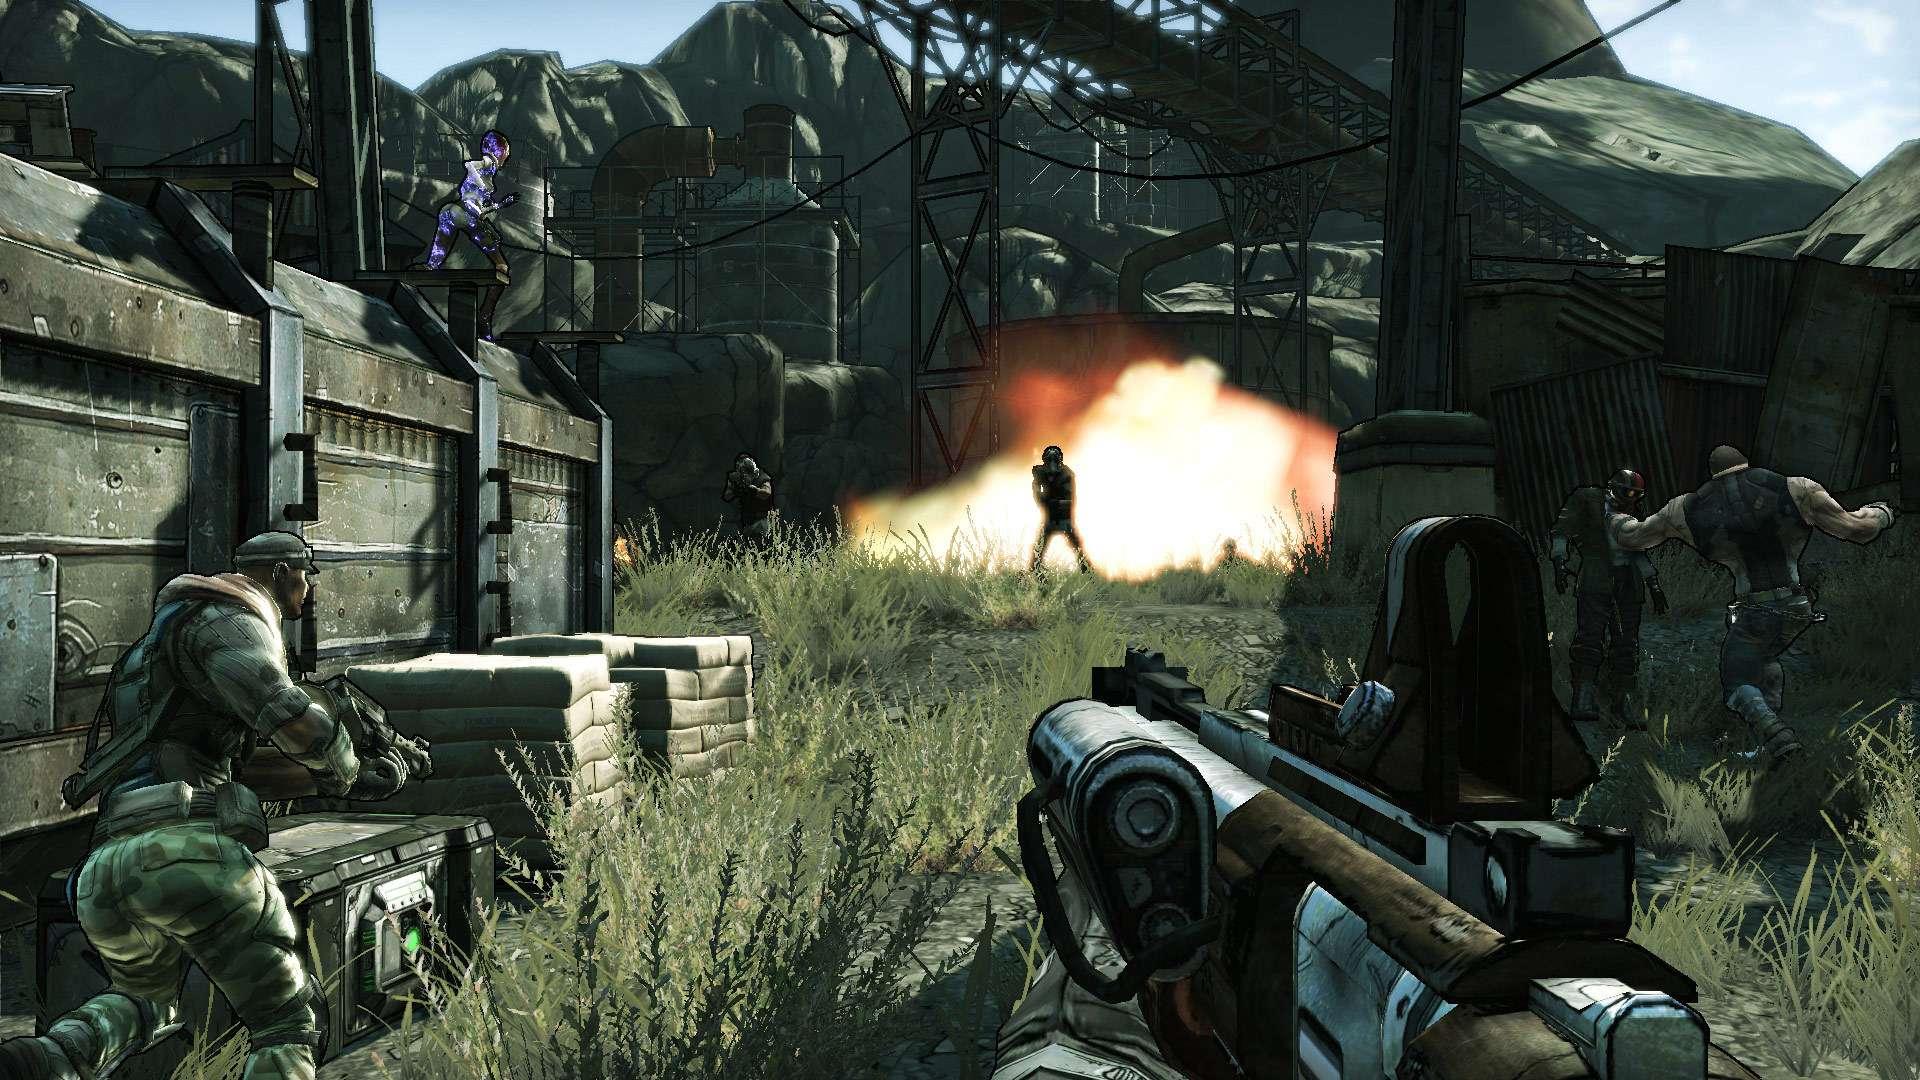 Screenshot from Borderlands (1/10)